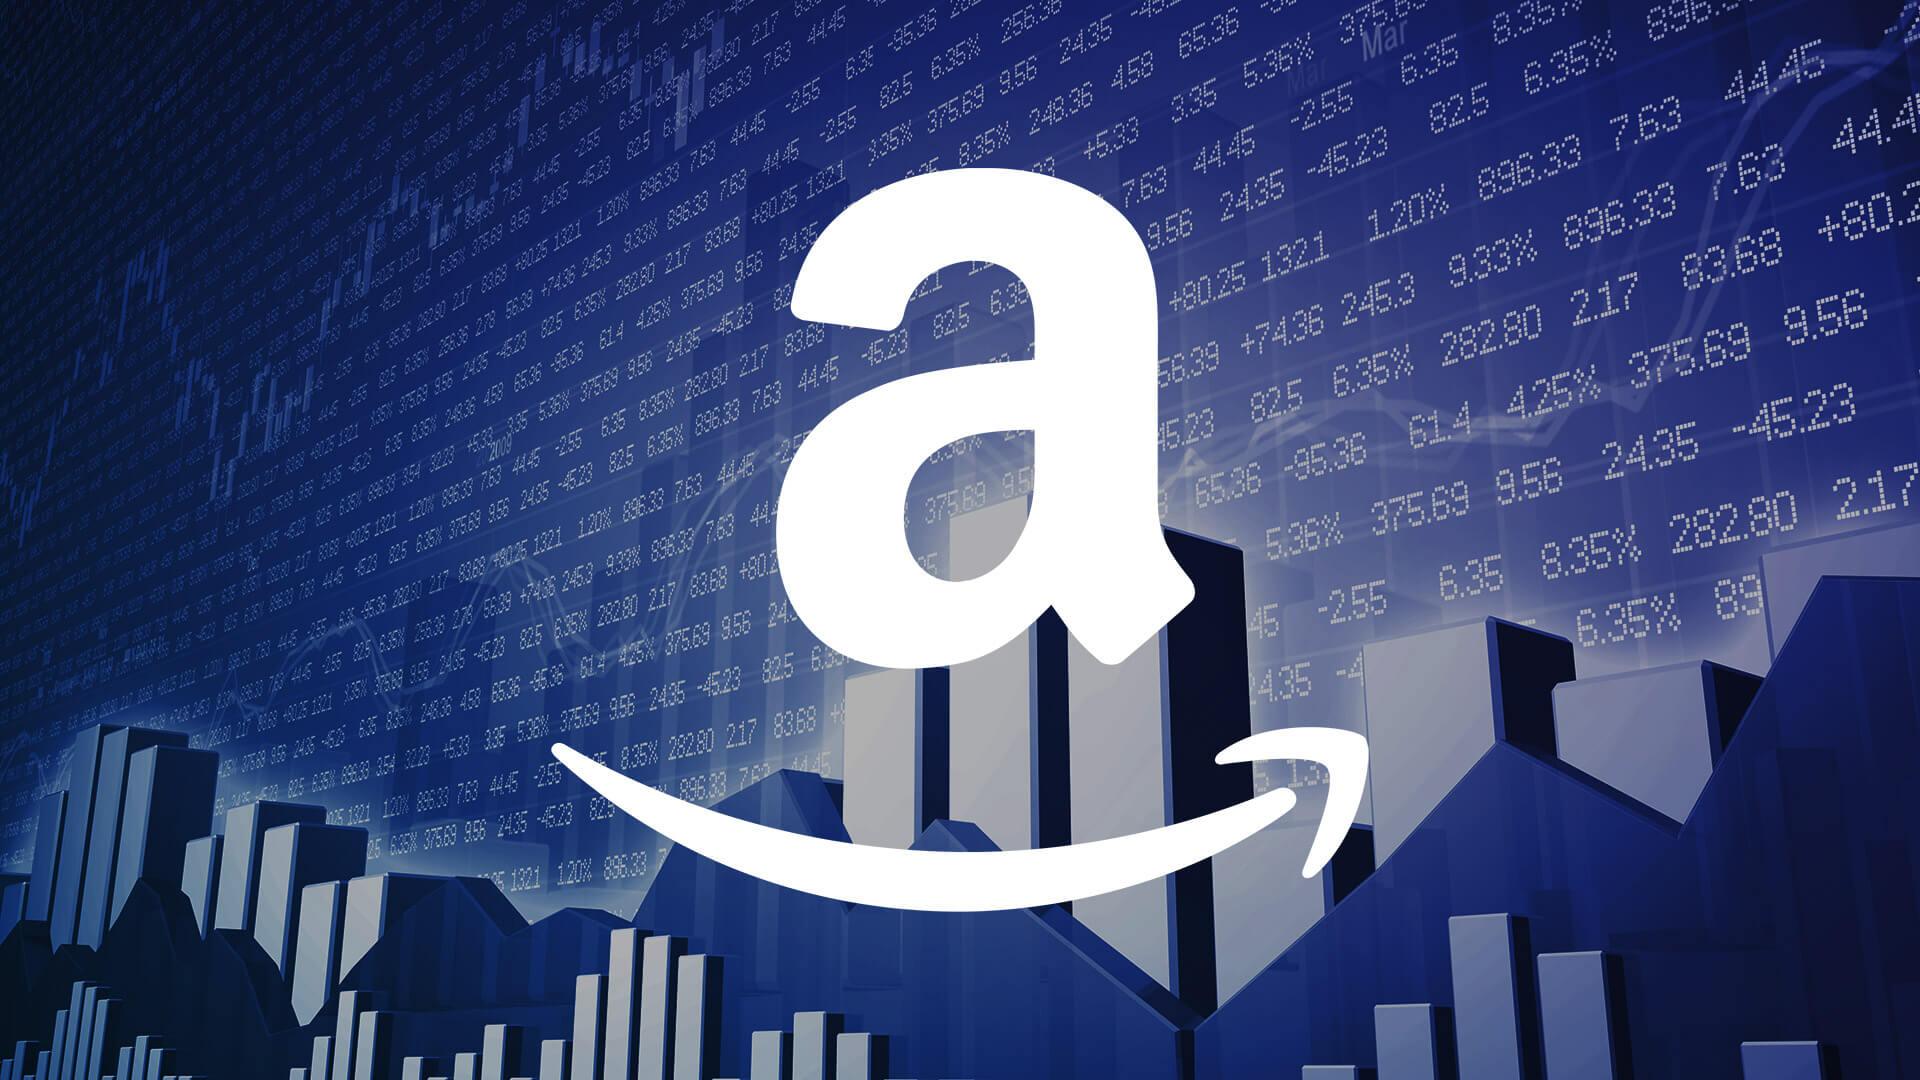 SEO - Teikametrics adds hourly bidding optimization for Amazon advertising